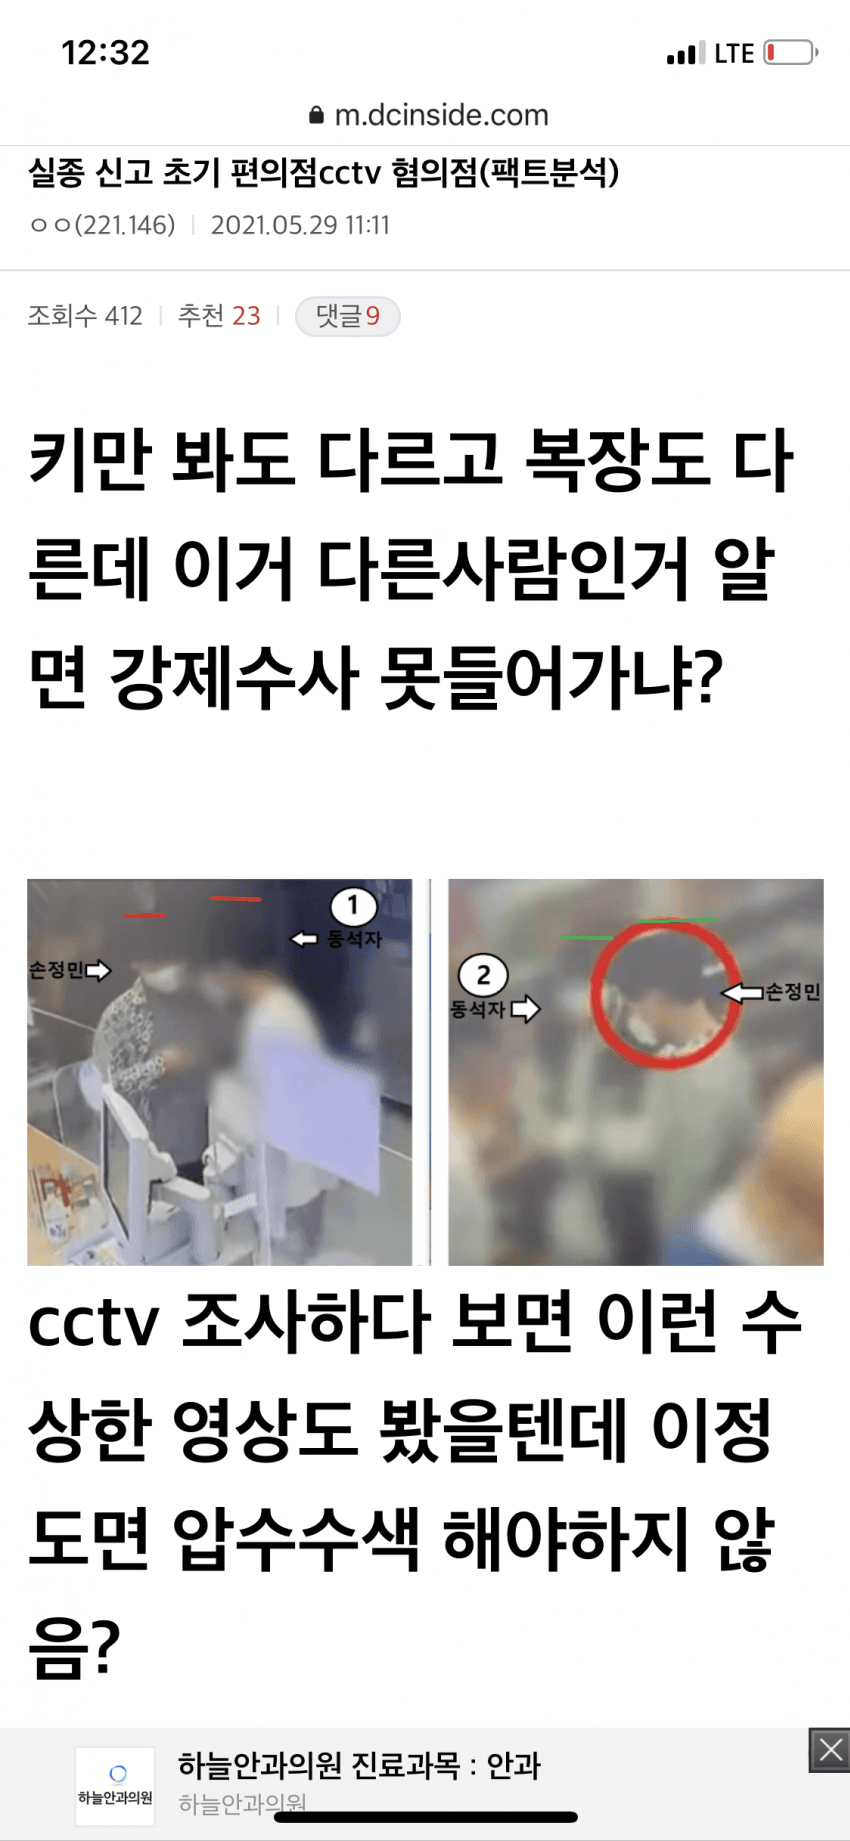 viewimage.php?no=24b0d769e1d32ca73dec8efa11d02831b210072811d995369f4ff39c9dd64d83cfc696835d6b86ff2e97eaeeac280bc3ab6f7dadabafdae67a18e8663d233a63b601ed14d29efb2fc743d60e5c32e1347fef5fe8d853ba260208881b1b33ec789586fa